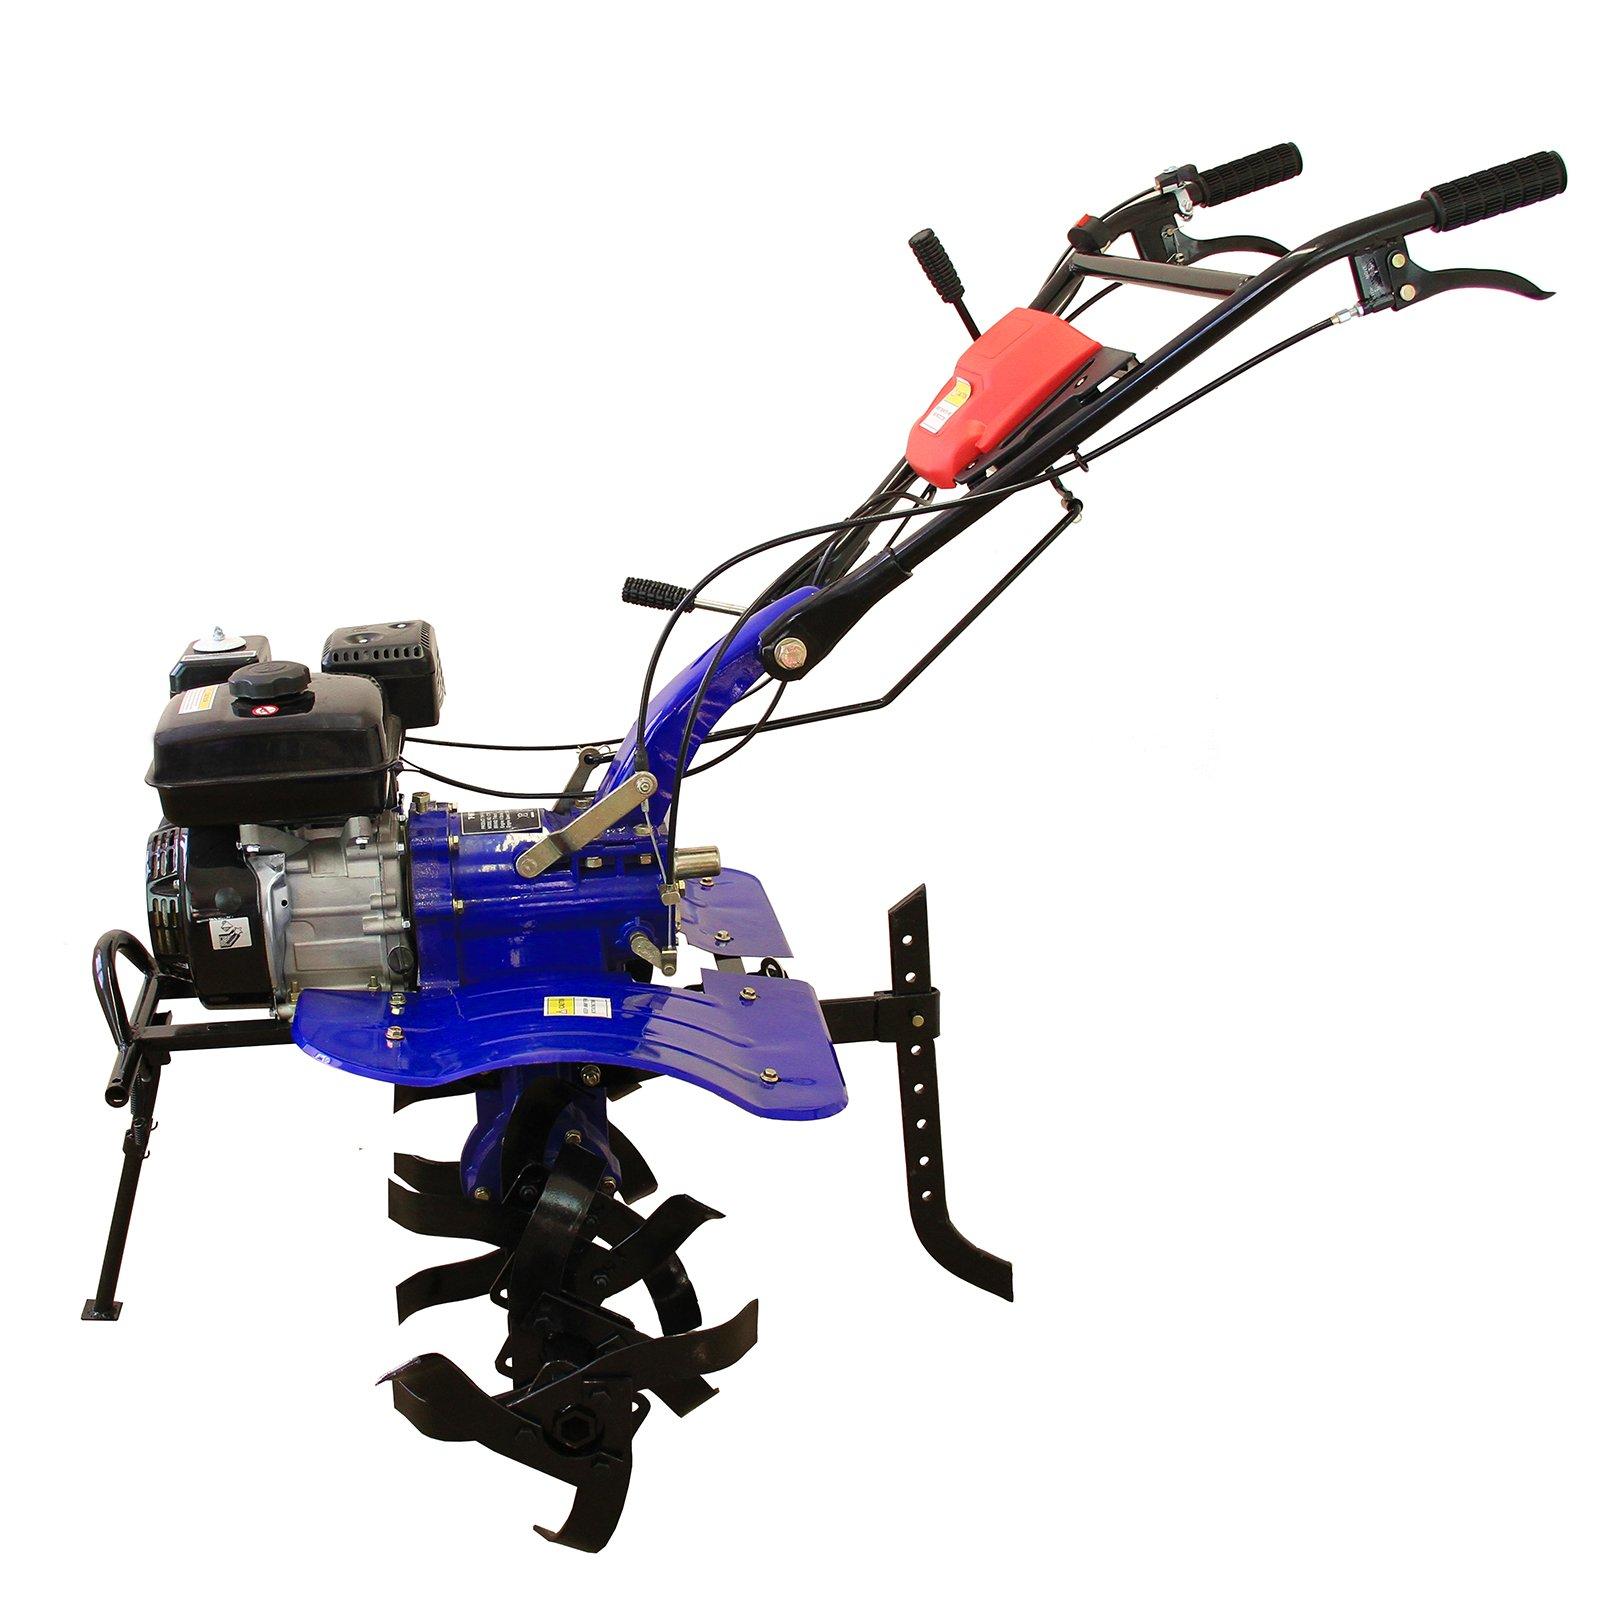 7HP Petrol Tiller Rotavator Cultivator Garden Power Tool 4 Stroke Gasoline 210cc